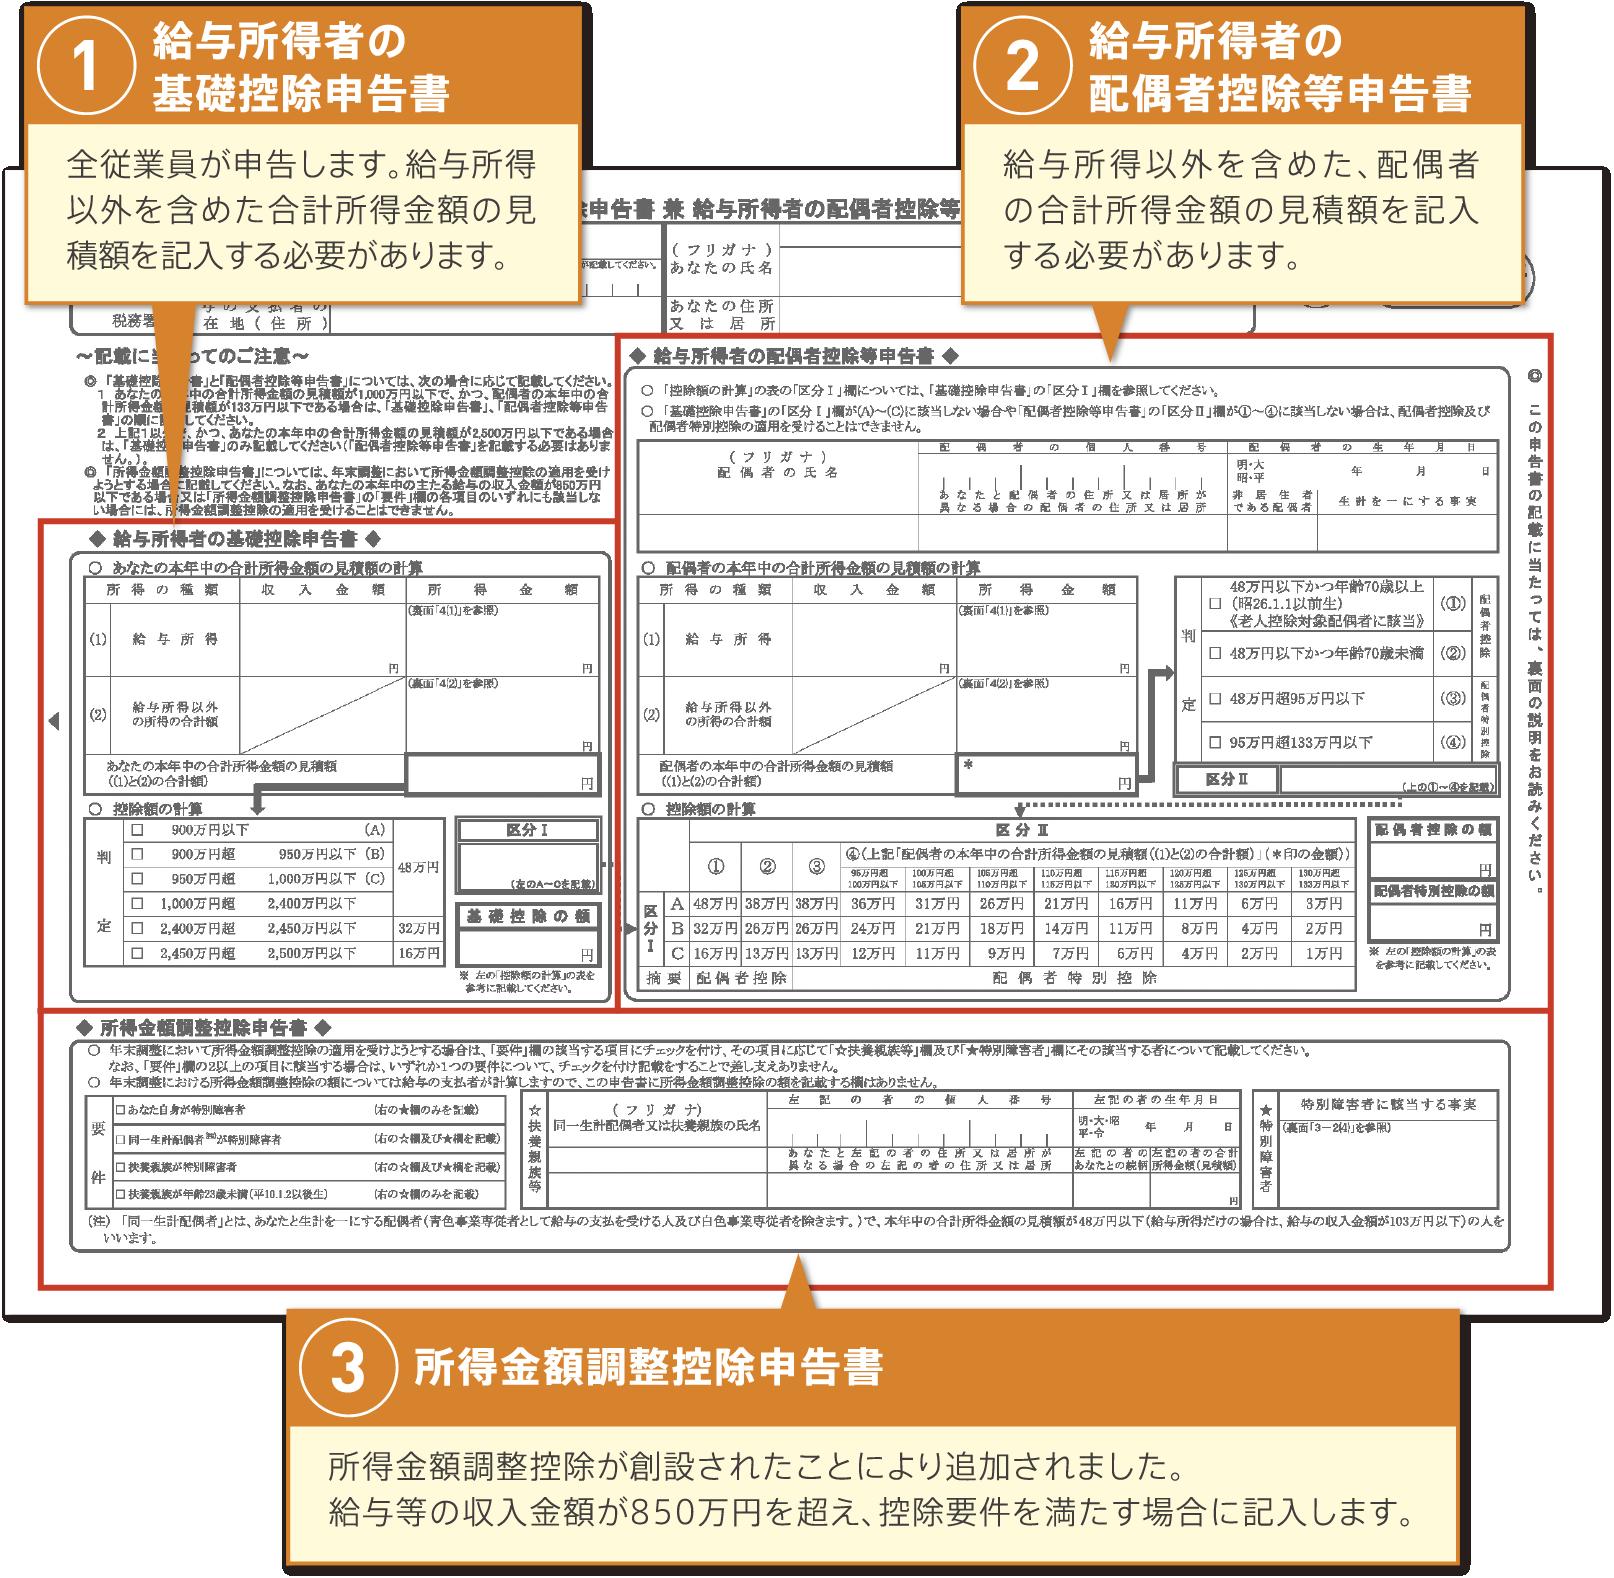 申告書の様式変更箇所